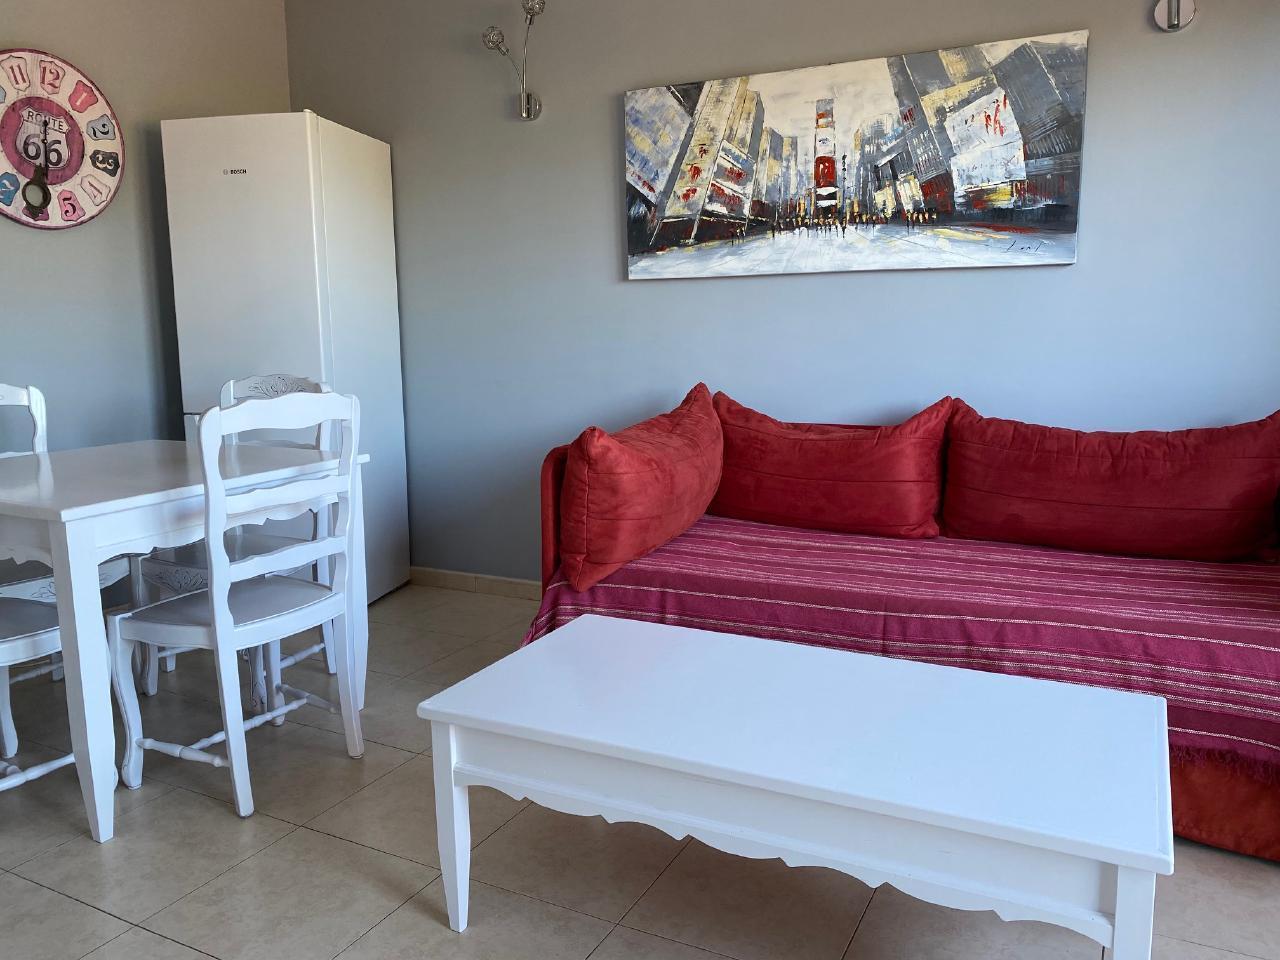 Ferienwohnung Apartments RO Corralejo (II) (431498), Corralejo, Fuerteventura, Kanarische Inseln, Spanien, Bild 22